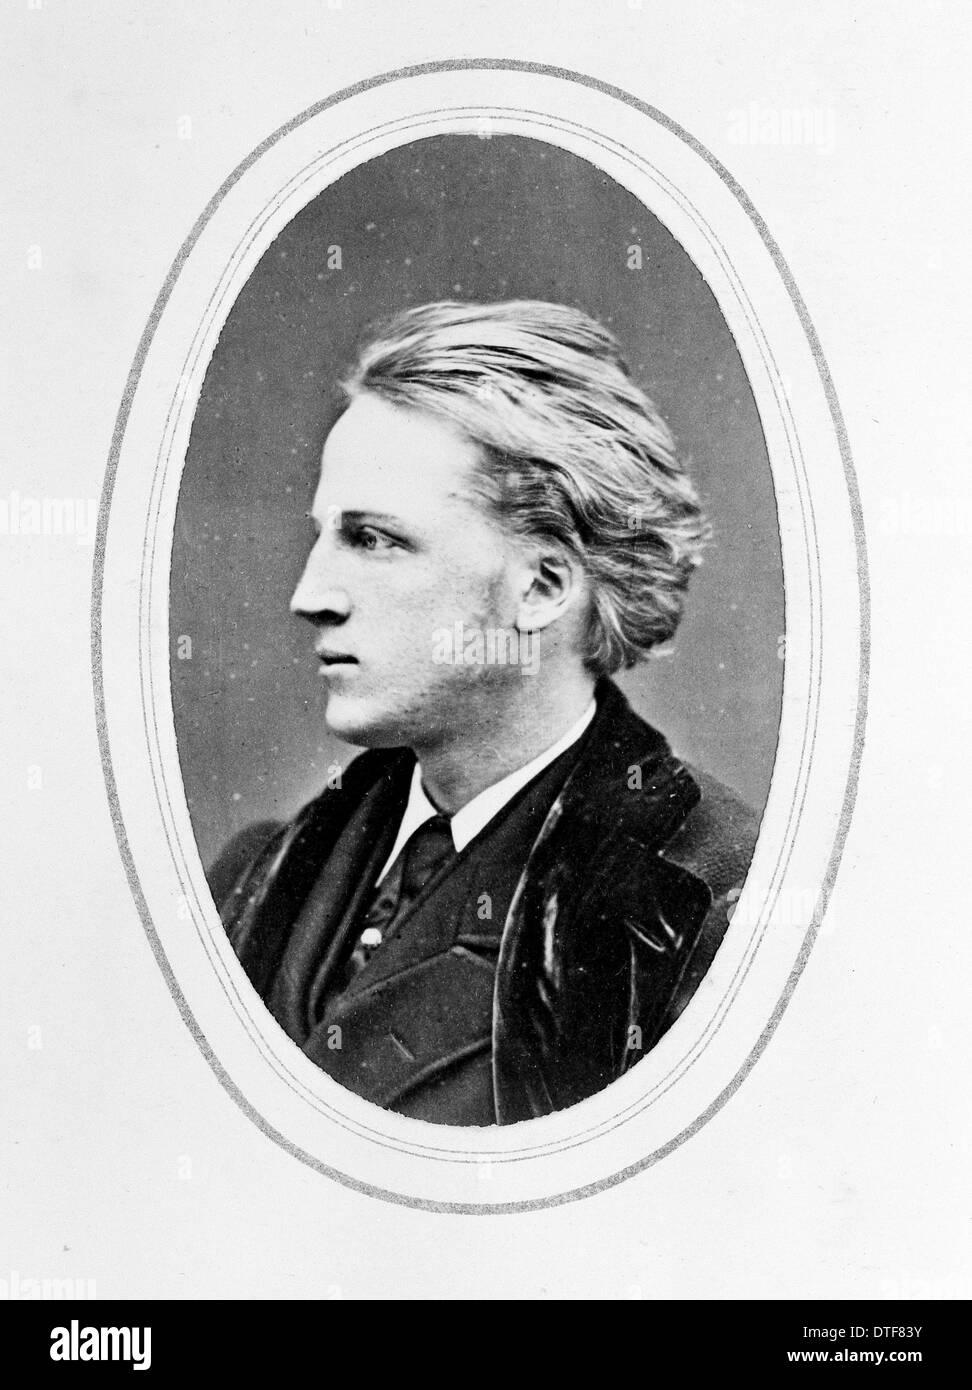 Duke of Argyll (1845-1914) - Stock Image